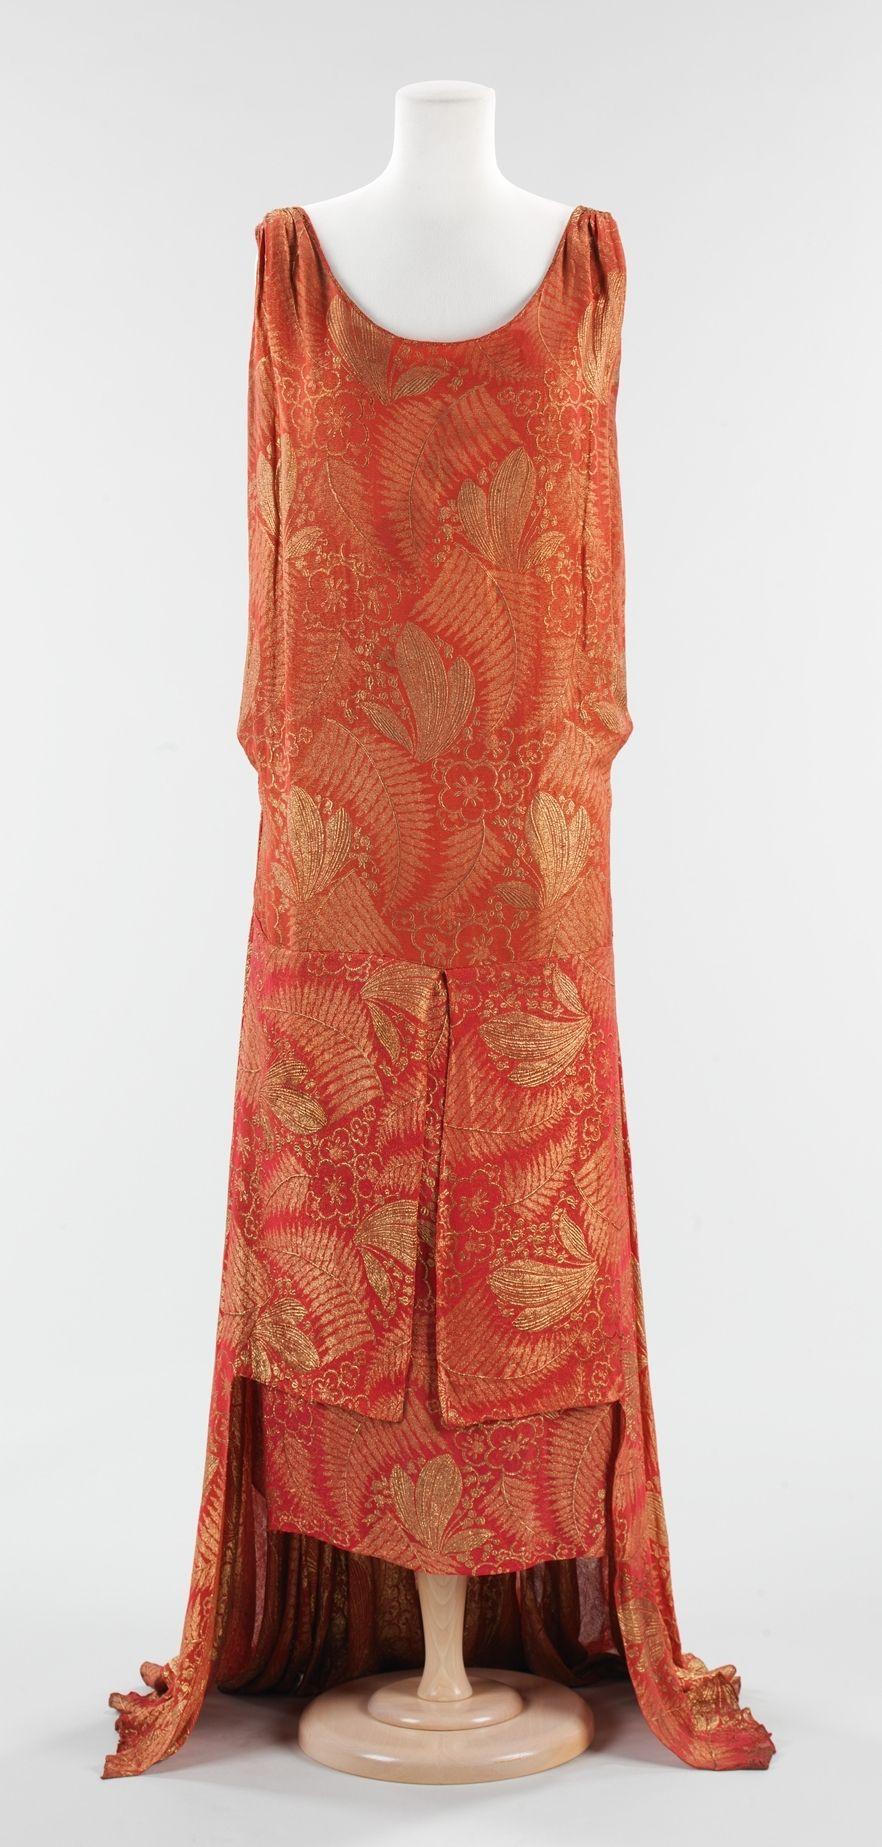 Bergdorf Goodman | Evening dress | American | The Met